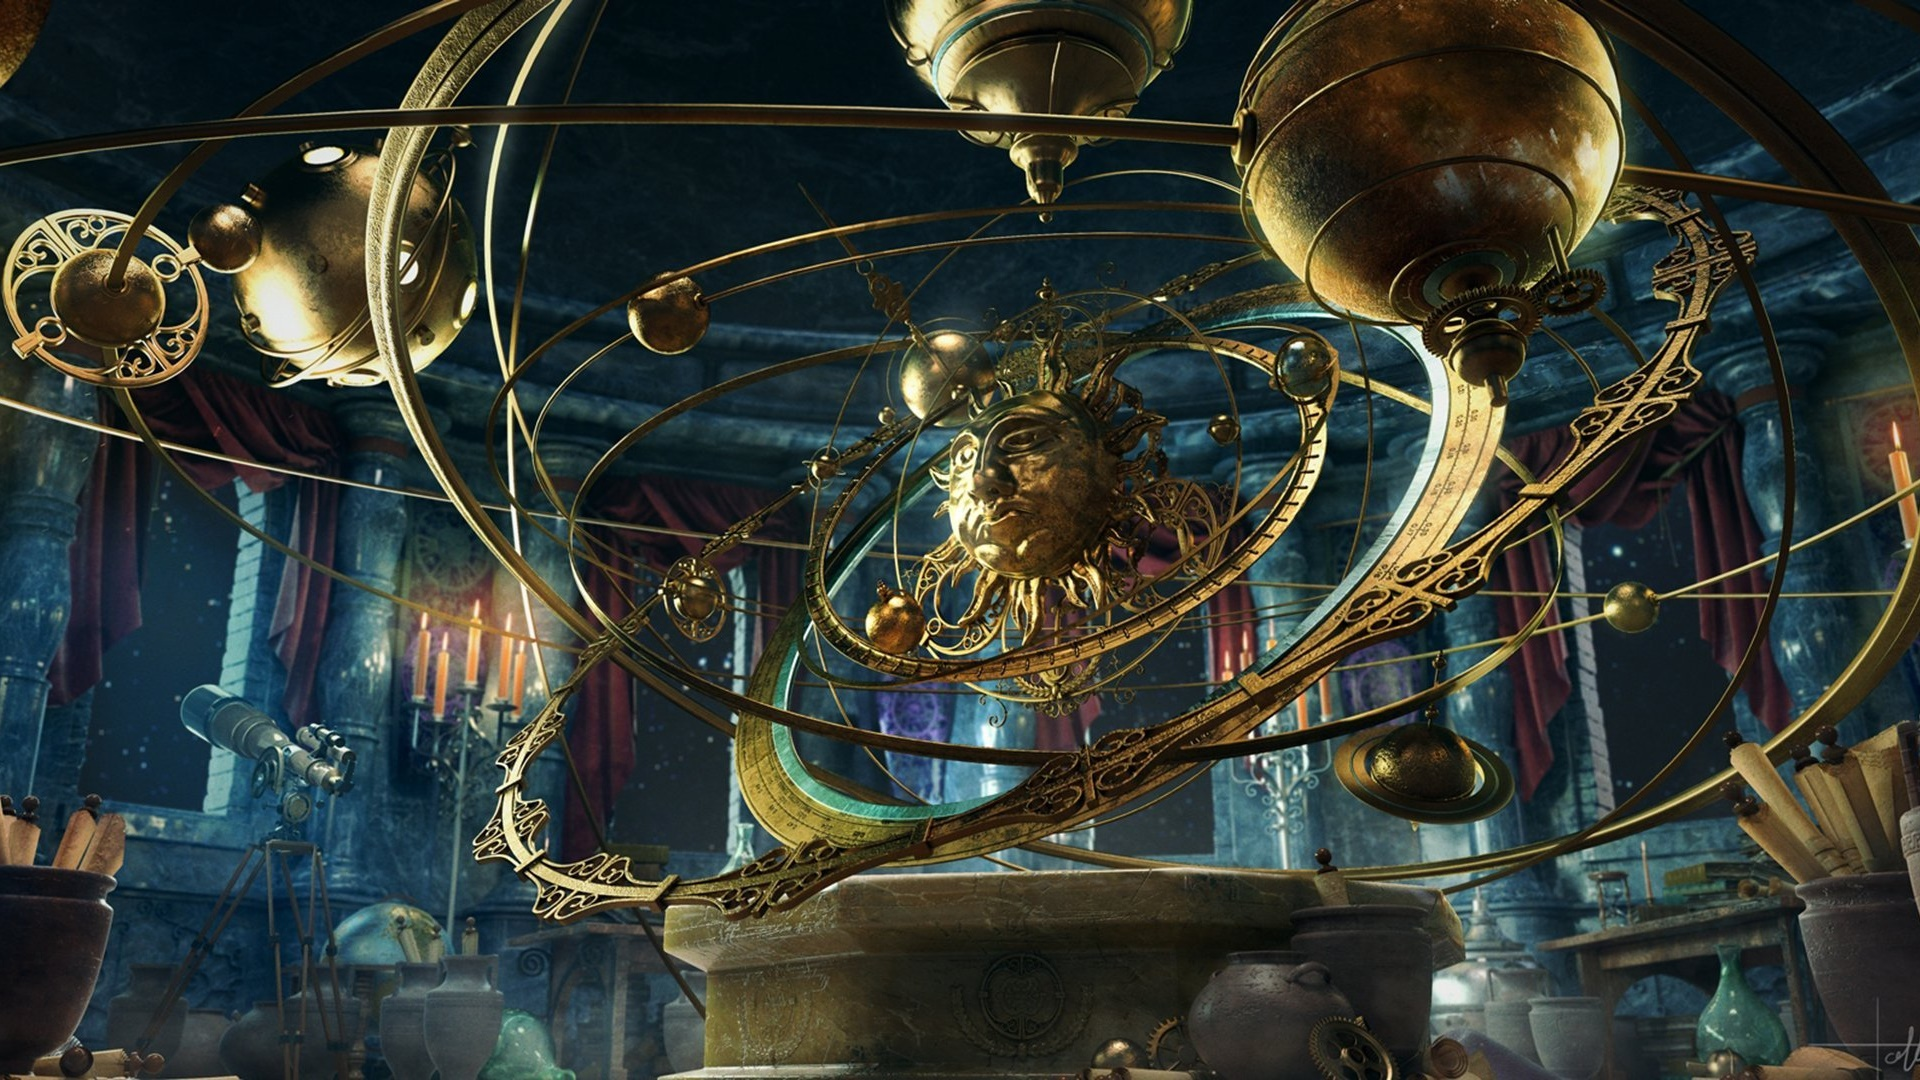 Steampunk planetarium wallpaper